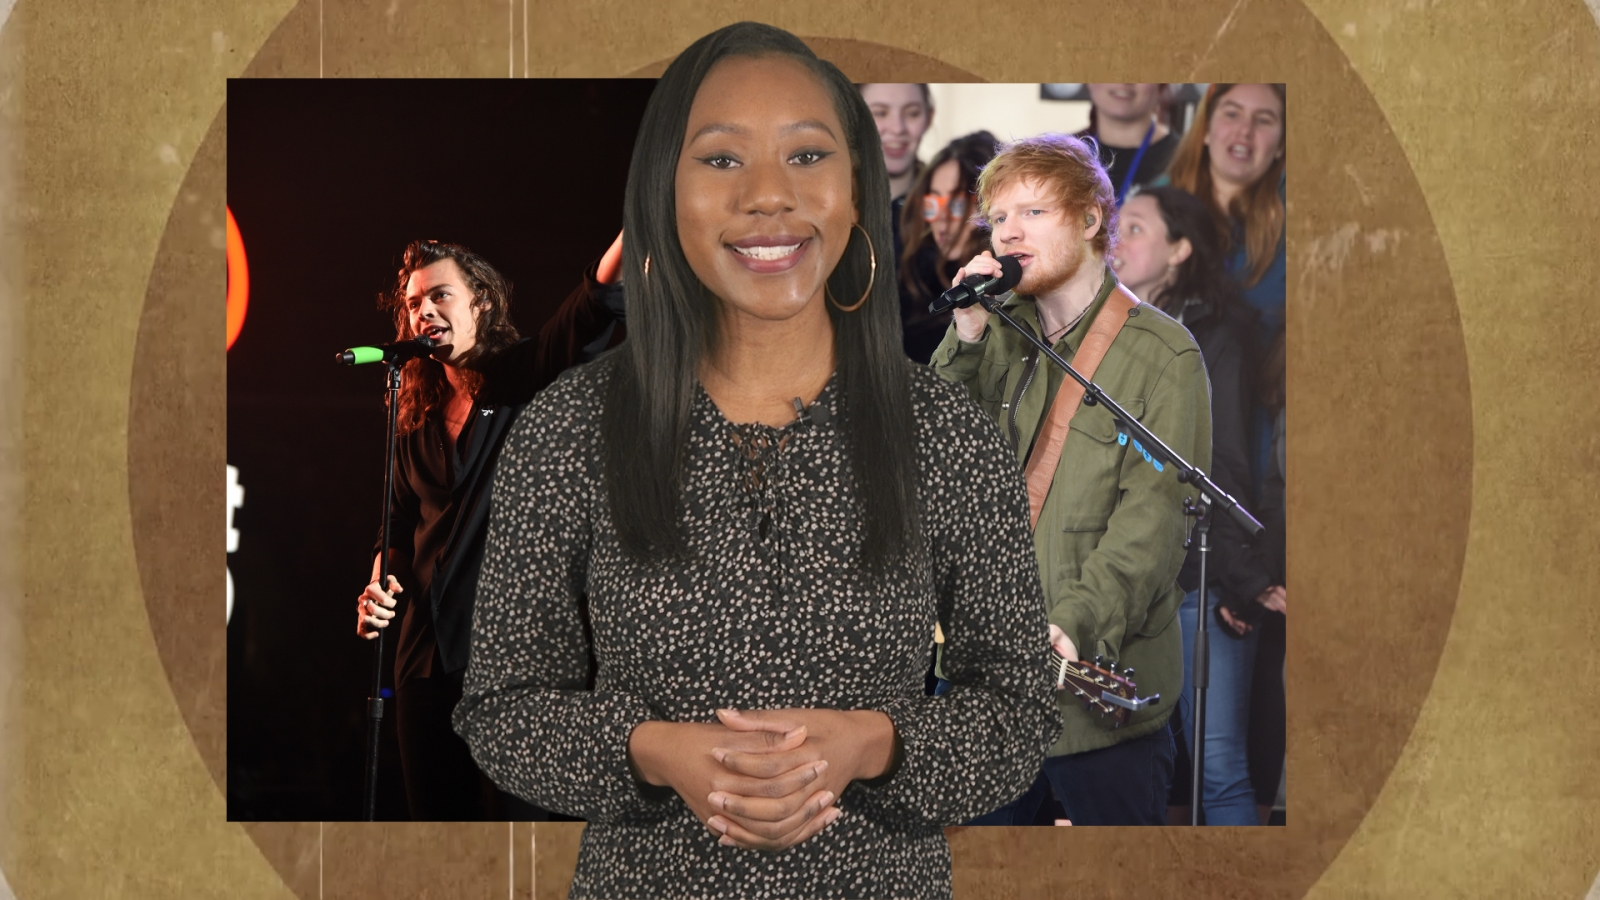 Music Minute: Harry Styles makes solo debut, Ed Sheeran headlines Teenage Cancer Trust concert